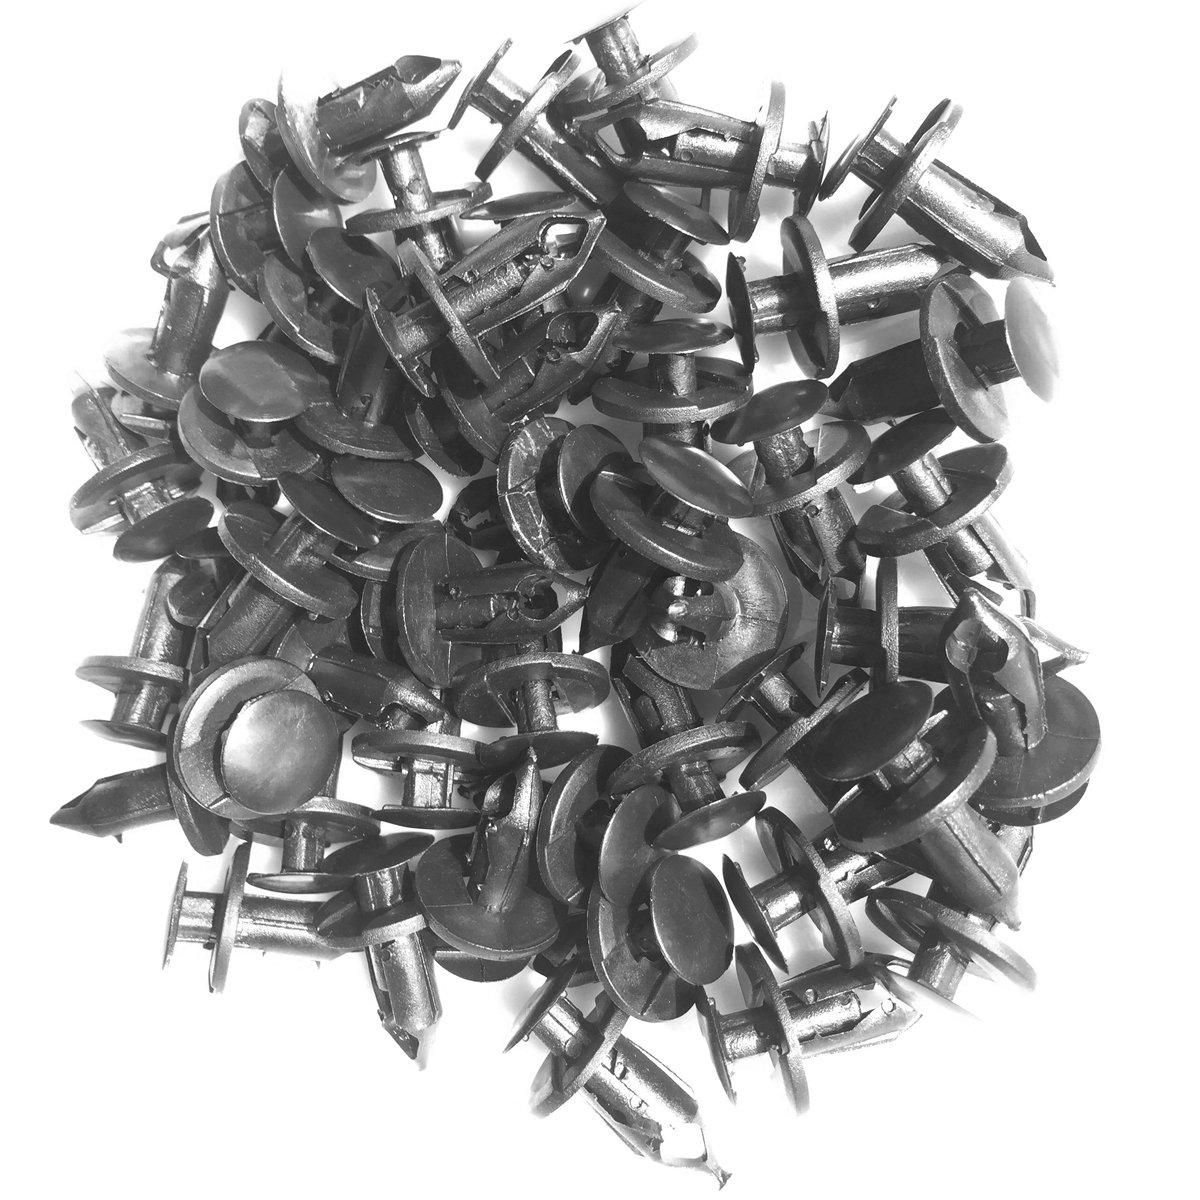 50 Pieces Universal Nylon Plastic Fastener Rivet Clips 8mm LTC28 Lantee Car Clips